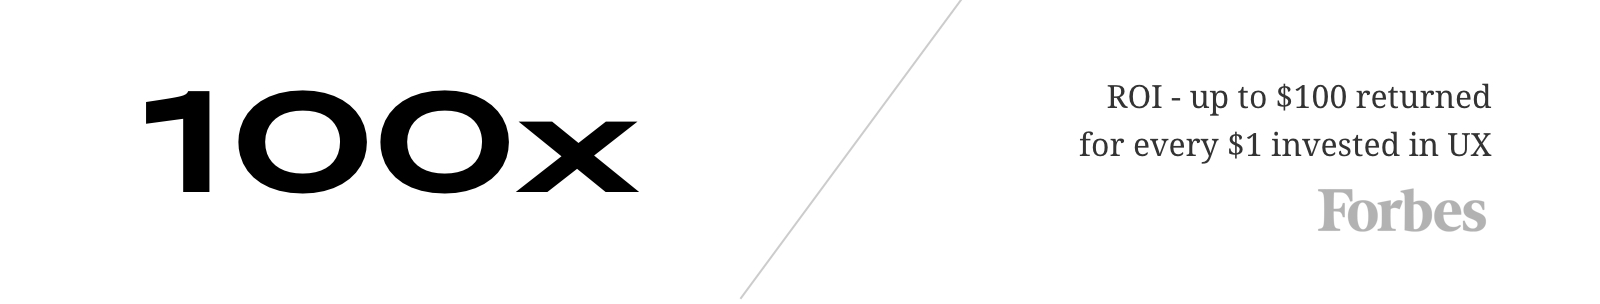 100x ROI-30kstrategy.jpg